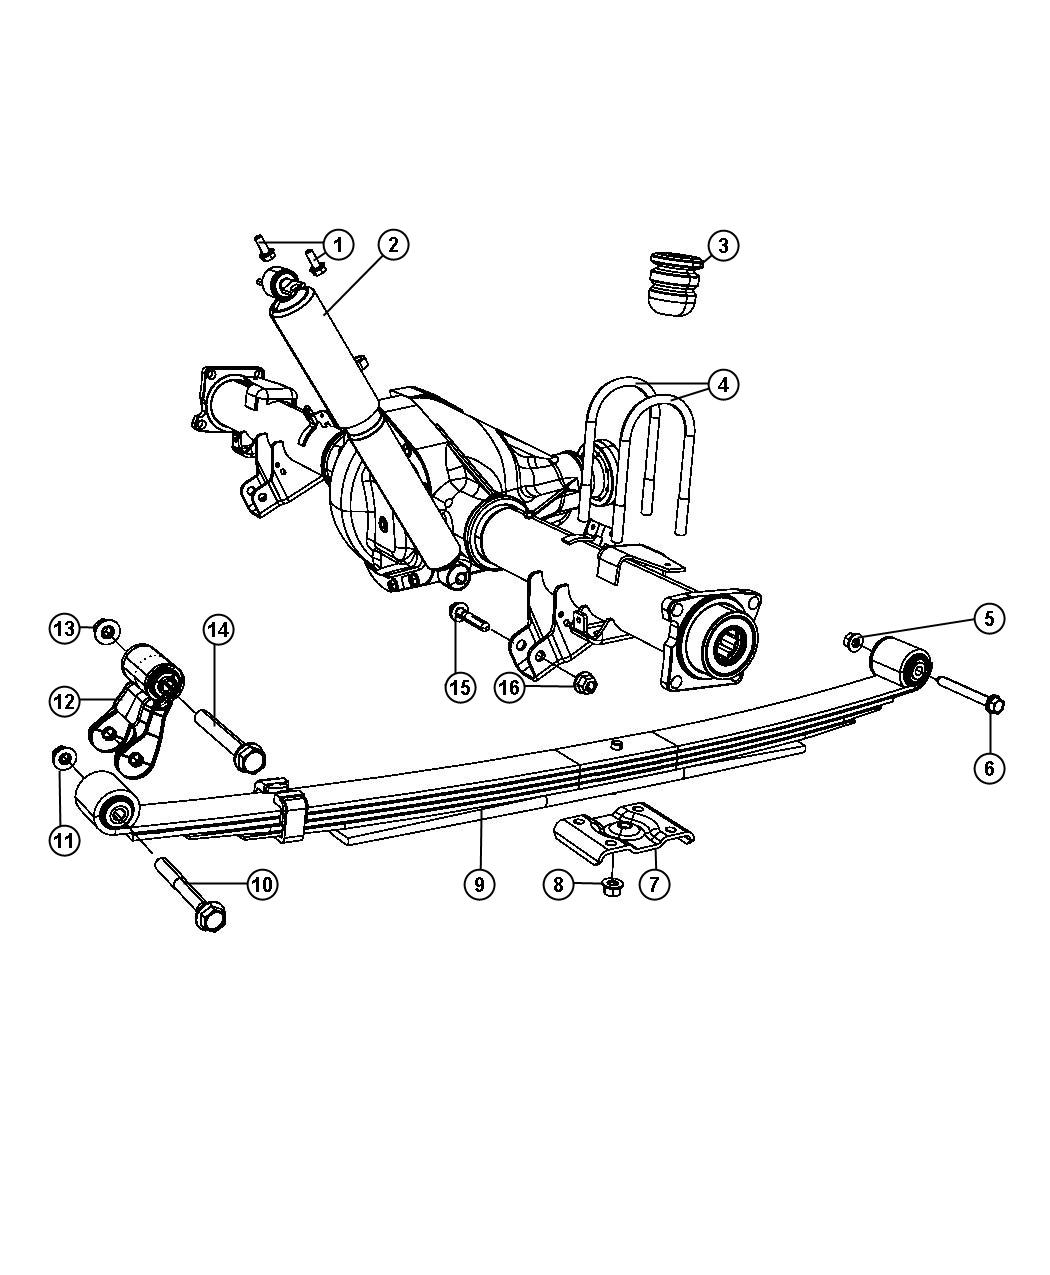 Dodge Ram 1500 Bolt, screw. Hex flange head, suspension